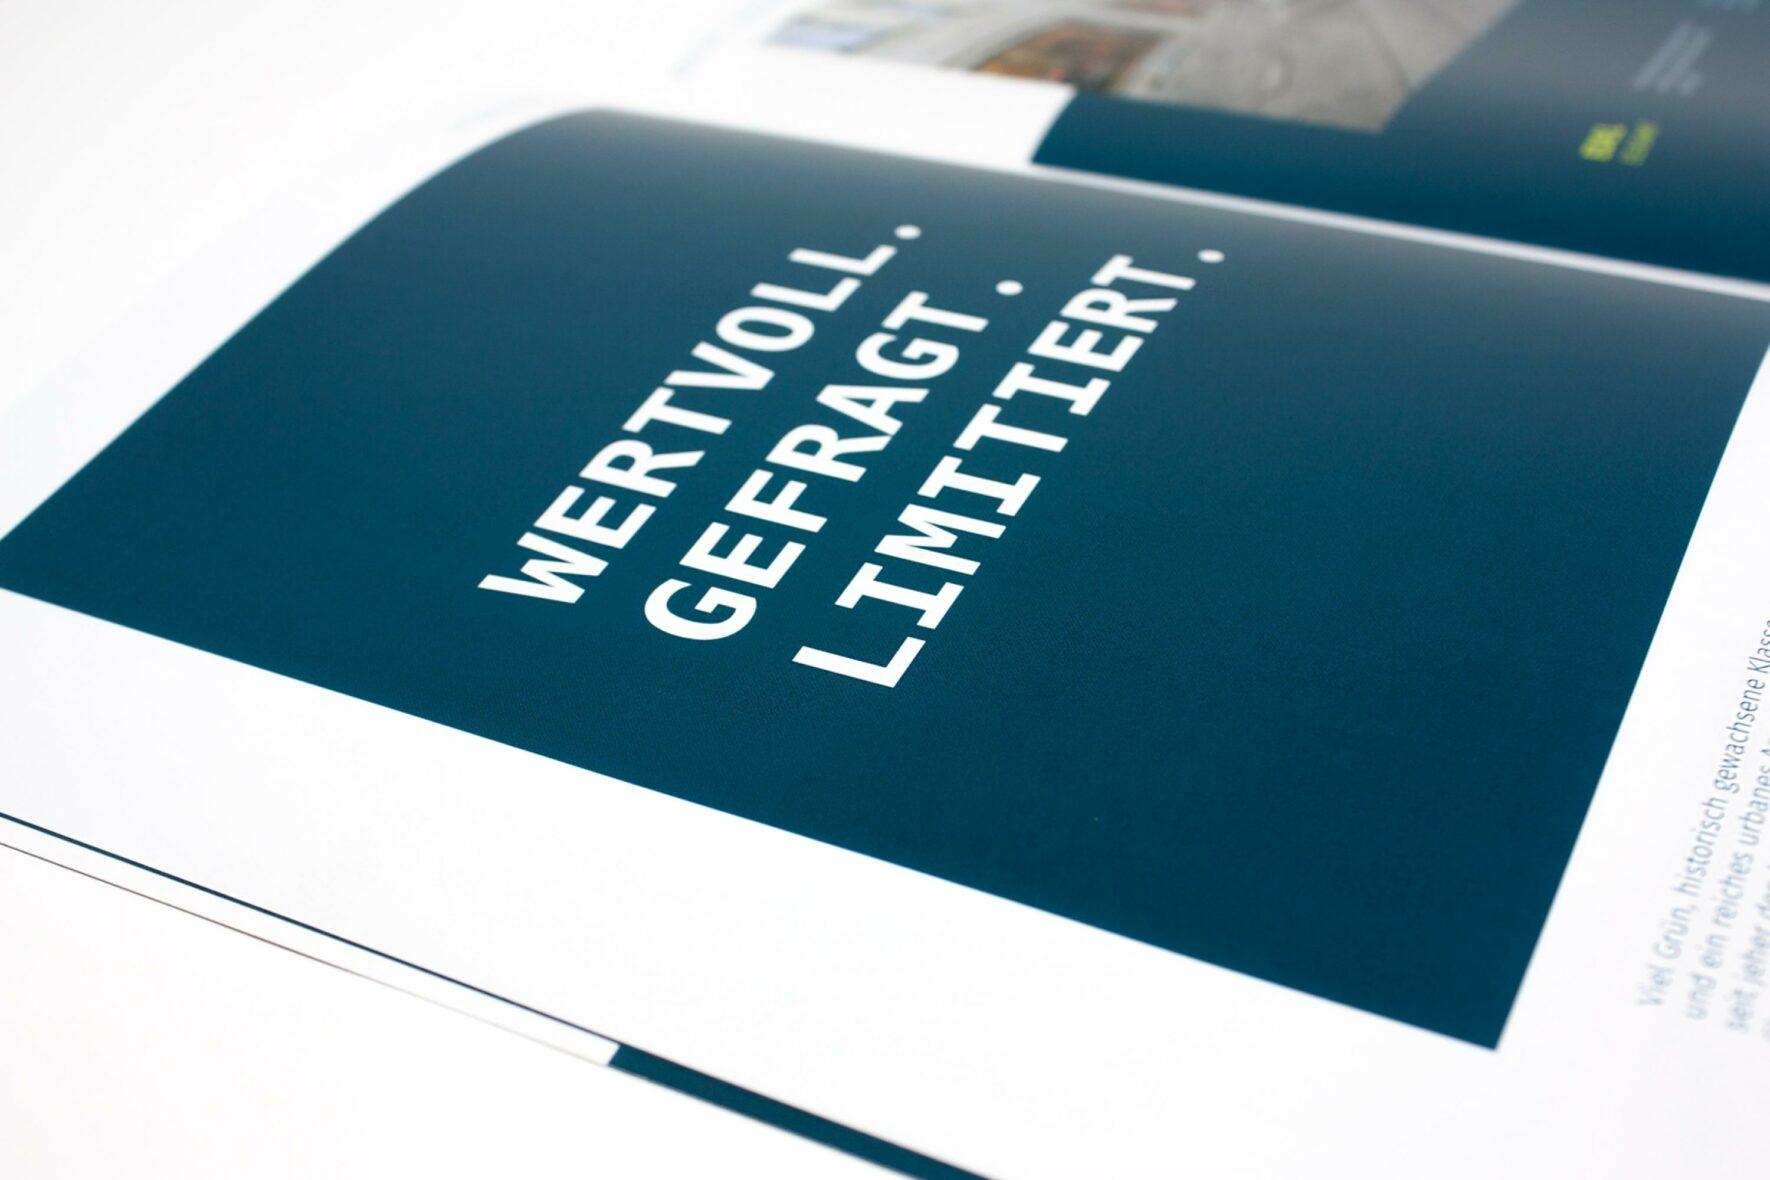 Broschuere-Leibniz-Immobilienbranding-Trendcity-FORMLOS-berlin-Print48